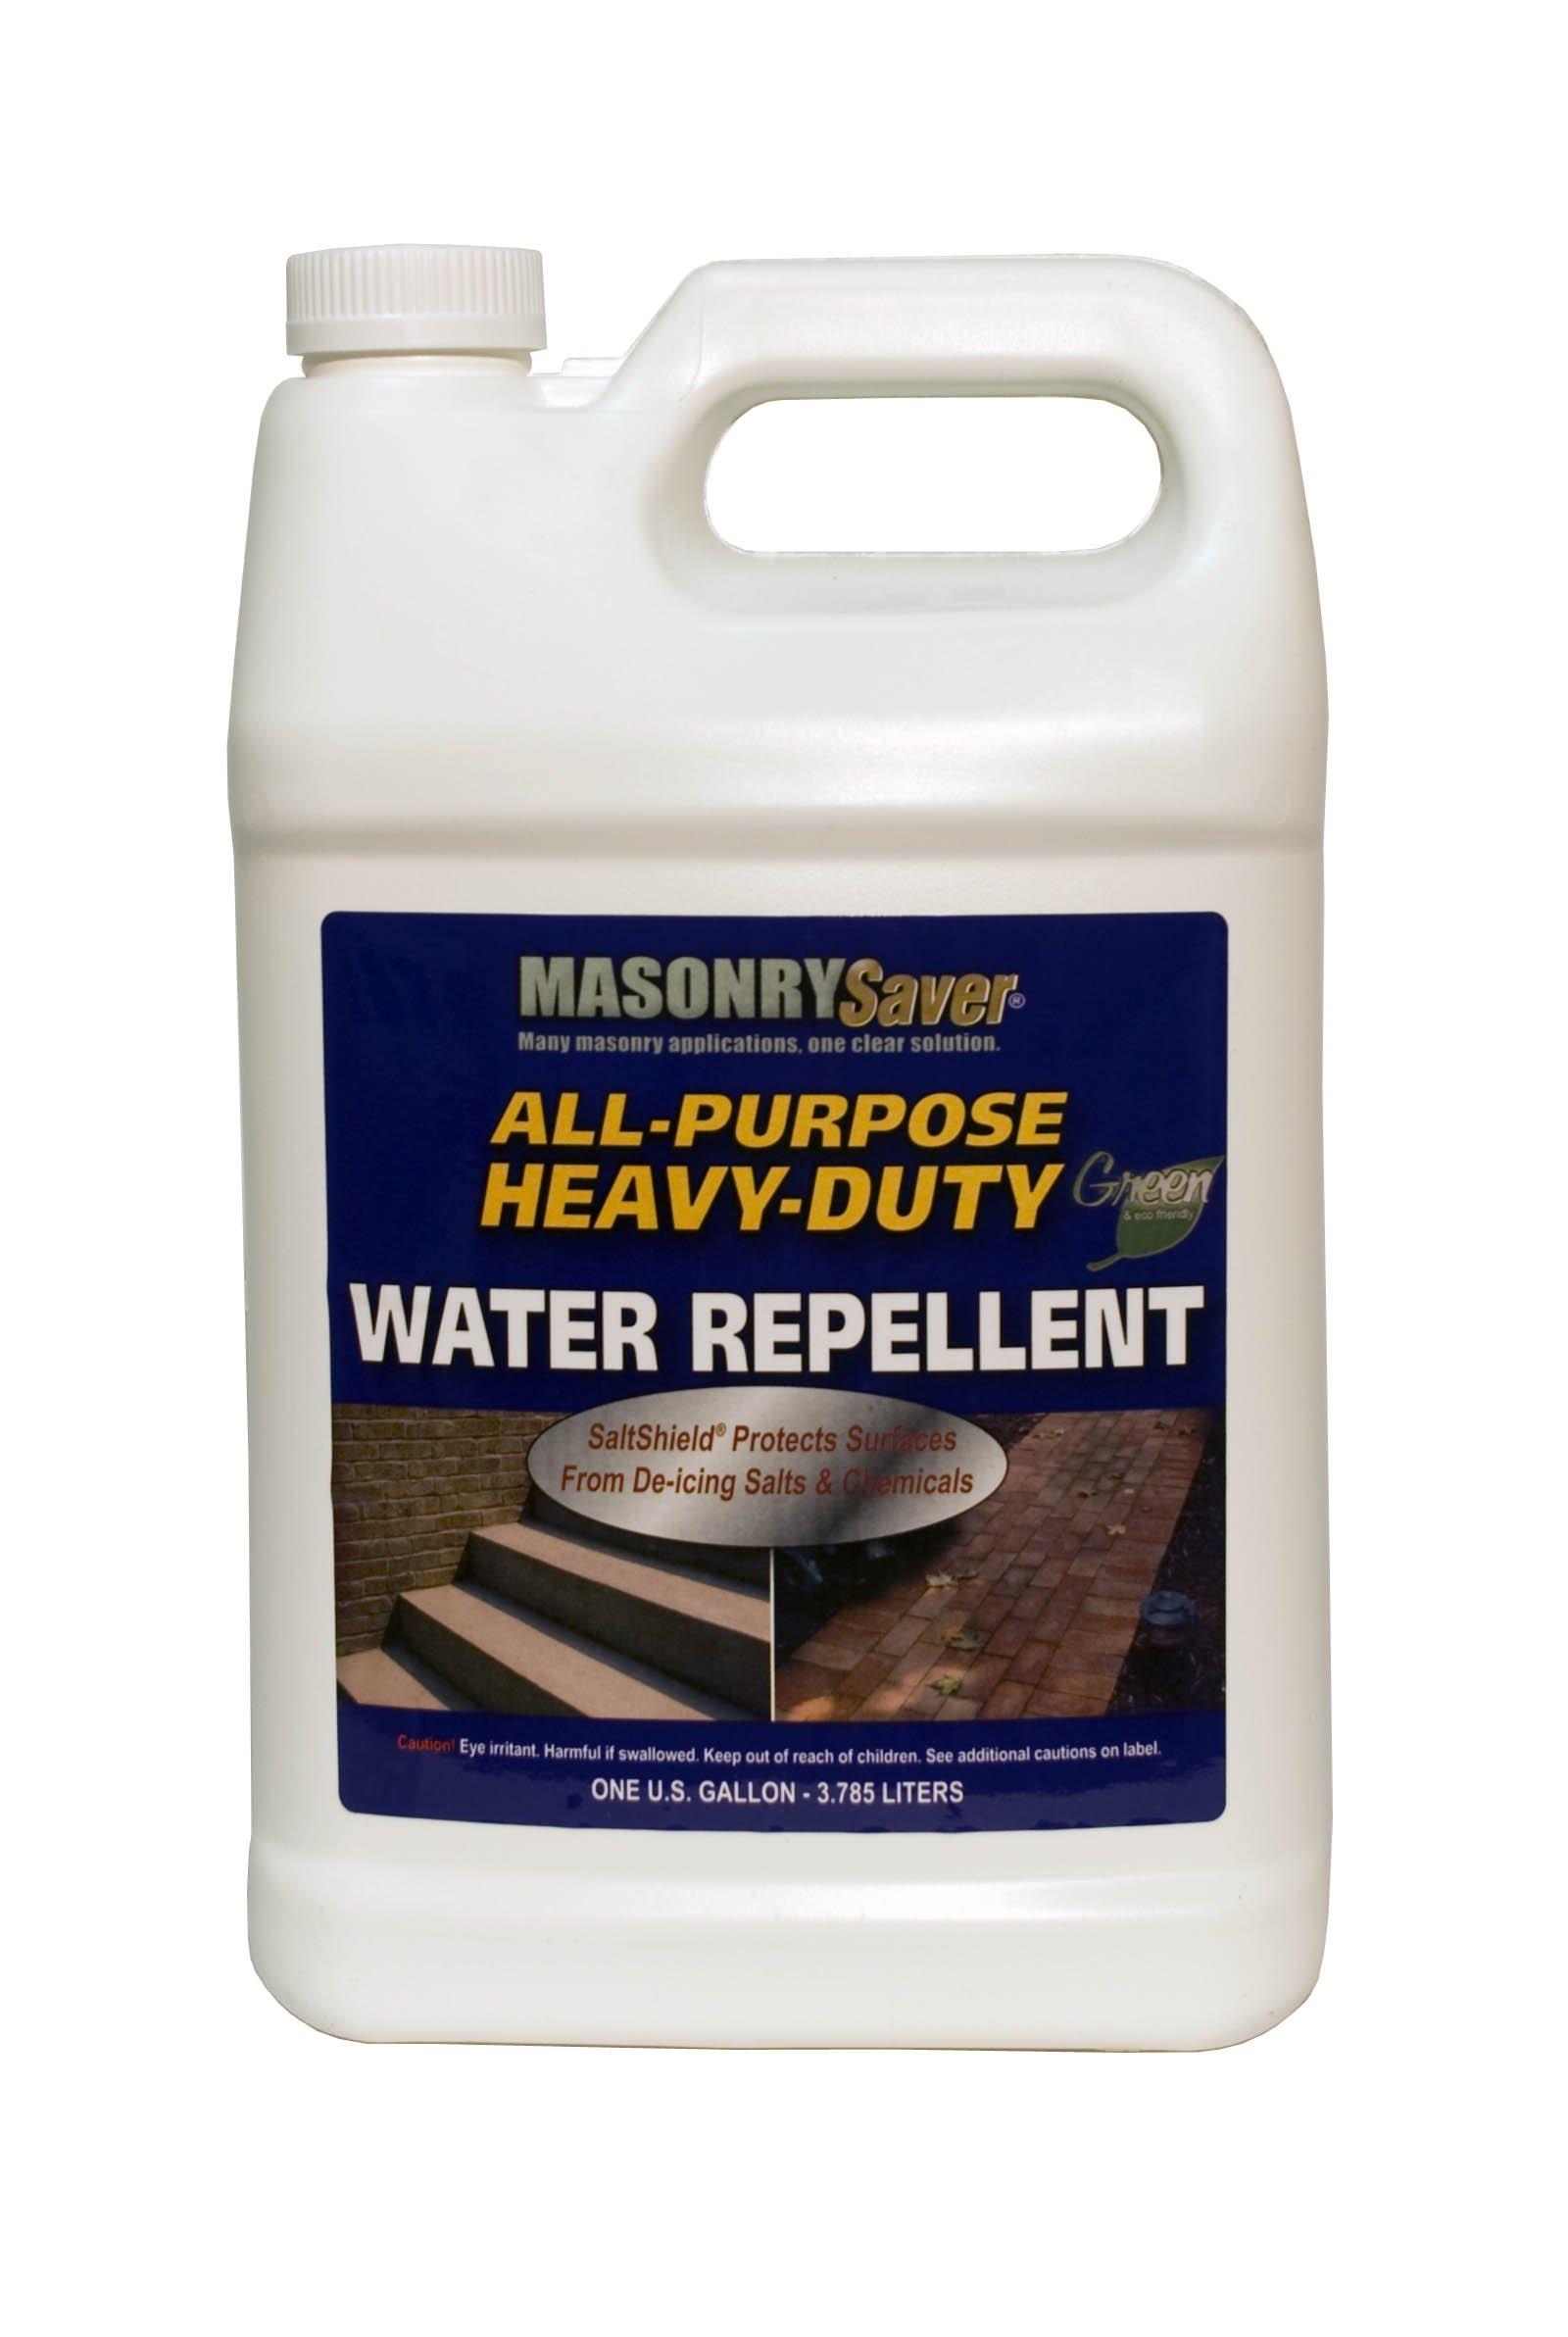 MasonrySaver All-Purpose Heavy Duty Water Repellent 1-gallon by MasonrySaver